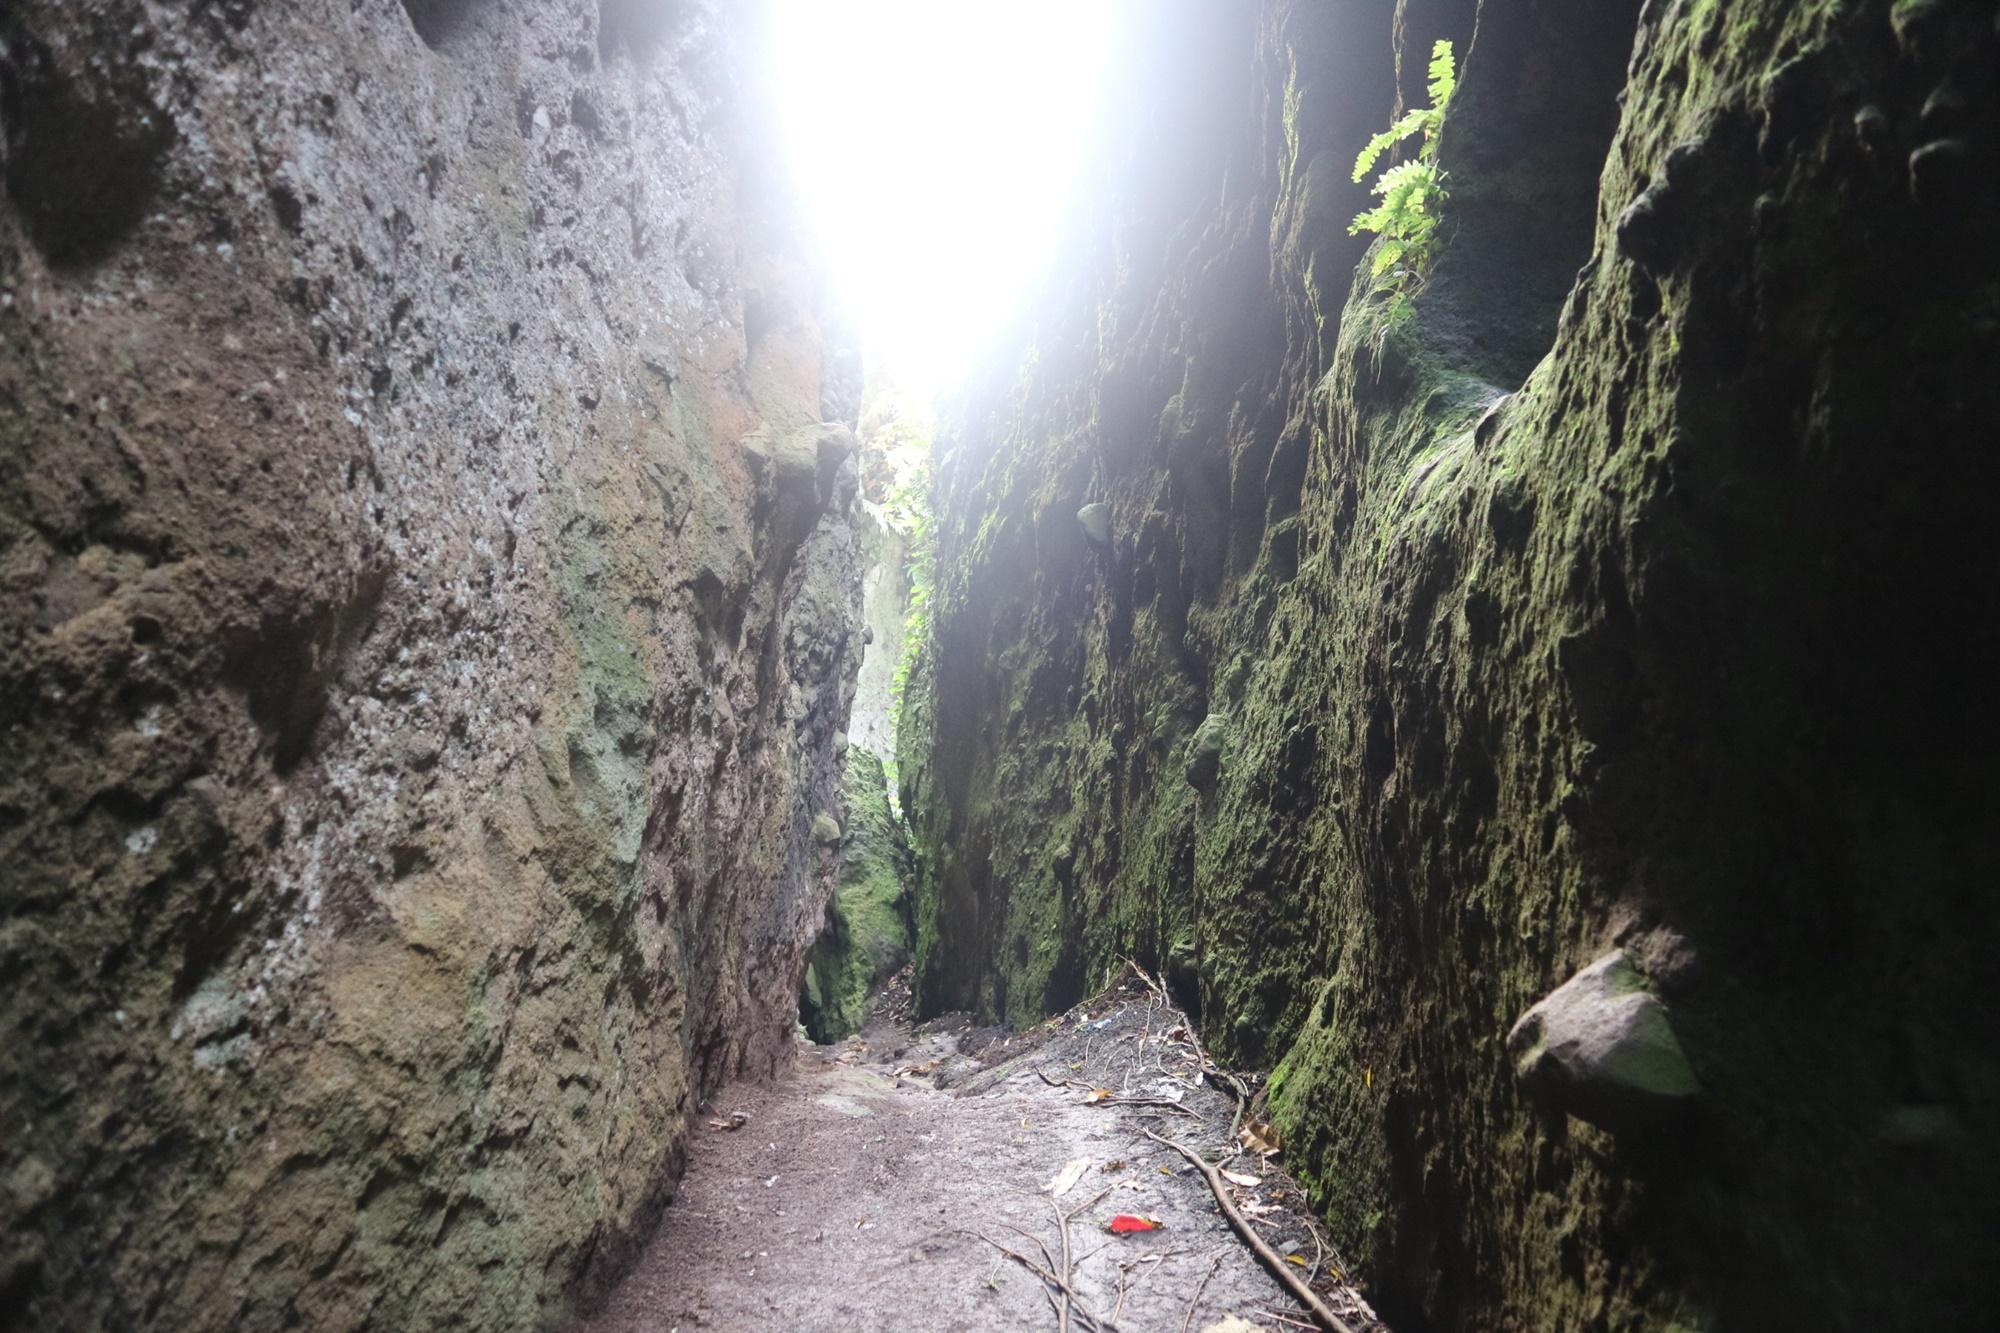 Jalan yang dihimpit batu raksasa